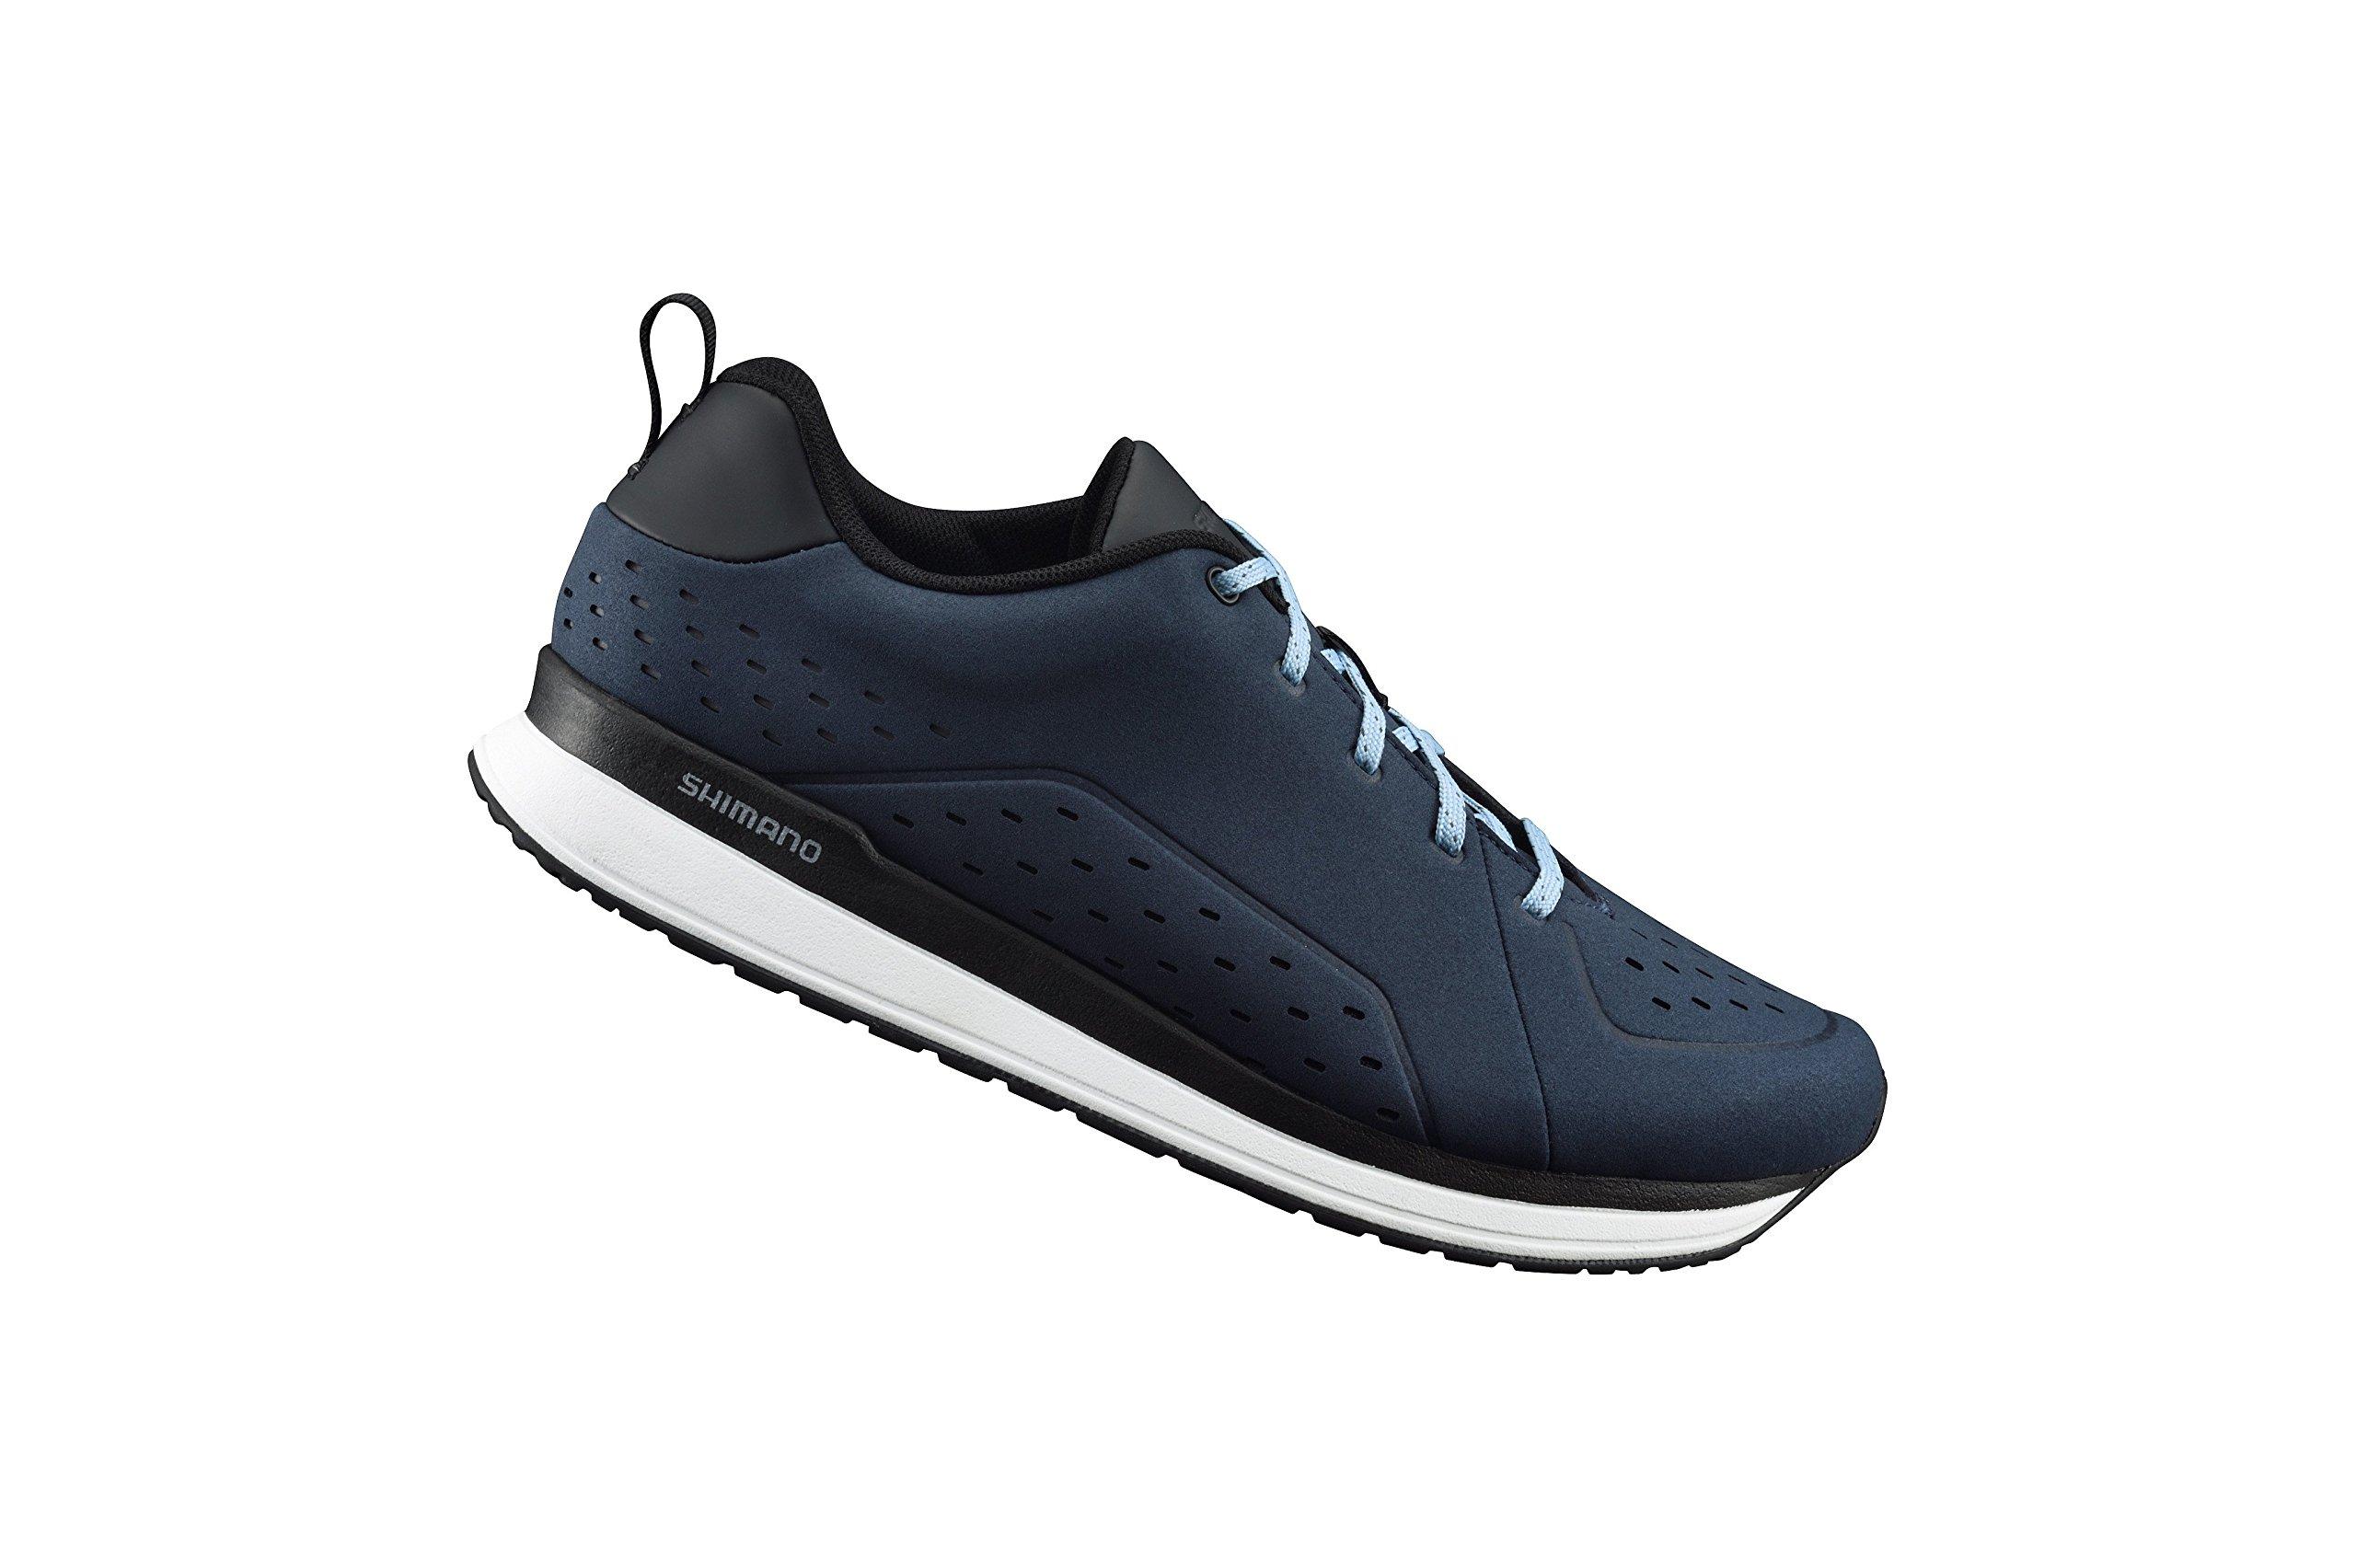 SHIMANO SH-CT5 Bicycle Shoes - Black - 40